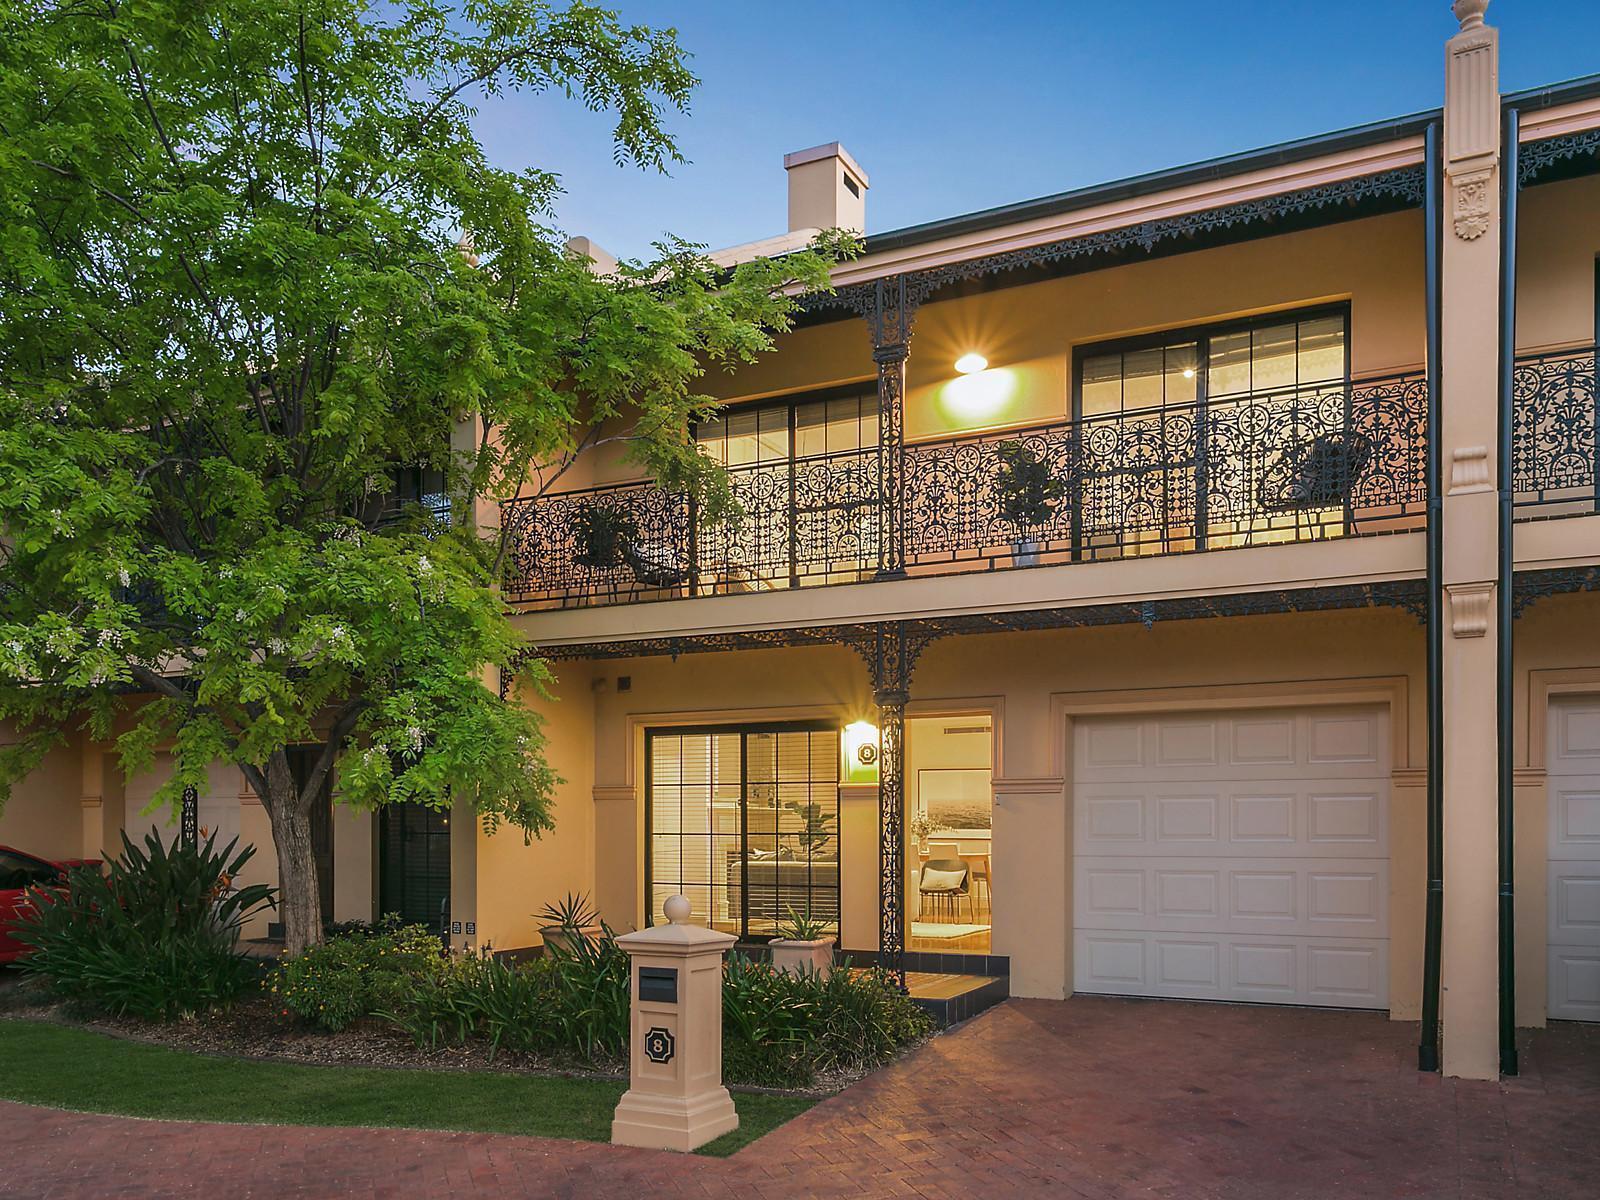 brighton le sands real estate for sale